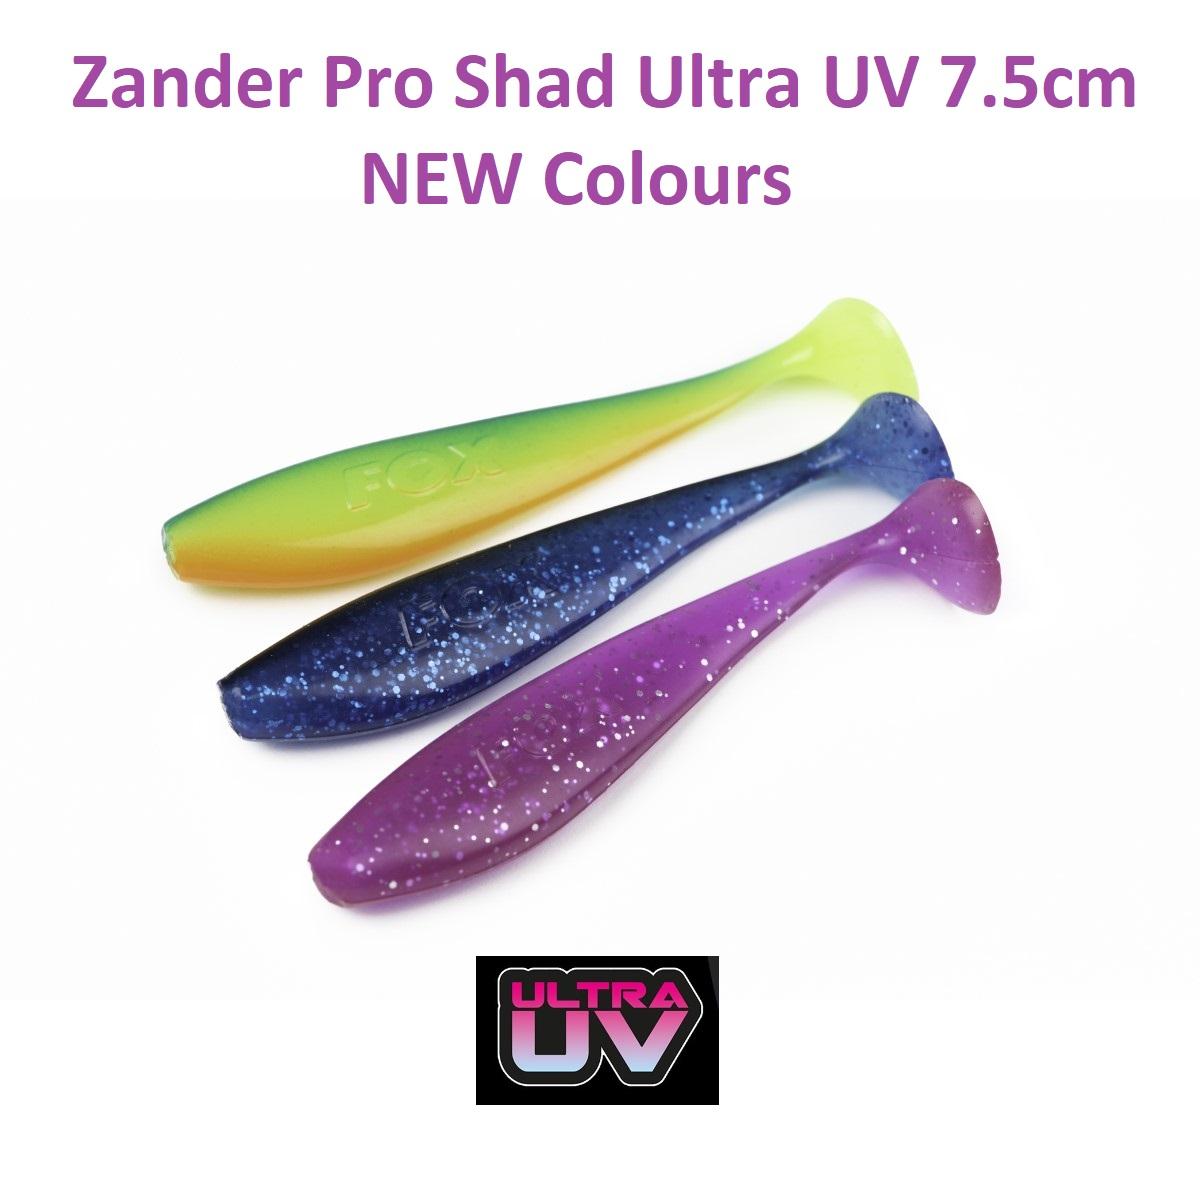 Силиконова примамка Fox Rage Zander Pro Shad Ultra UV 7.5cm NEW